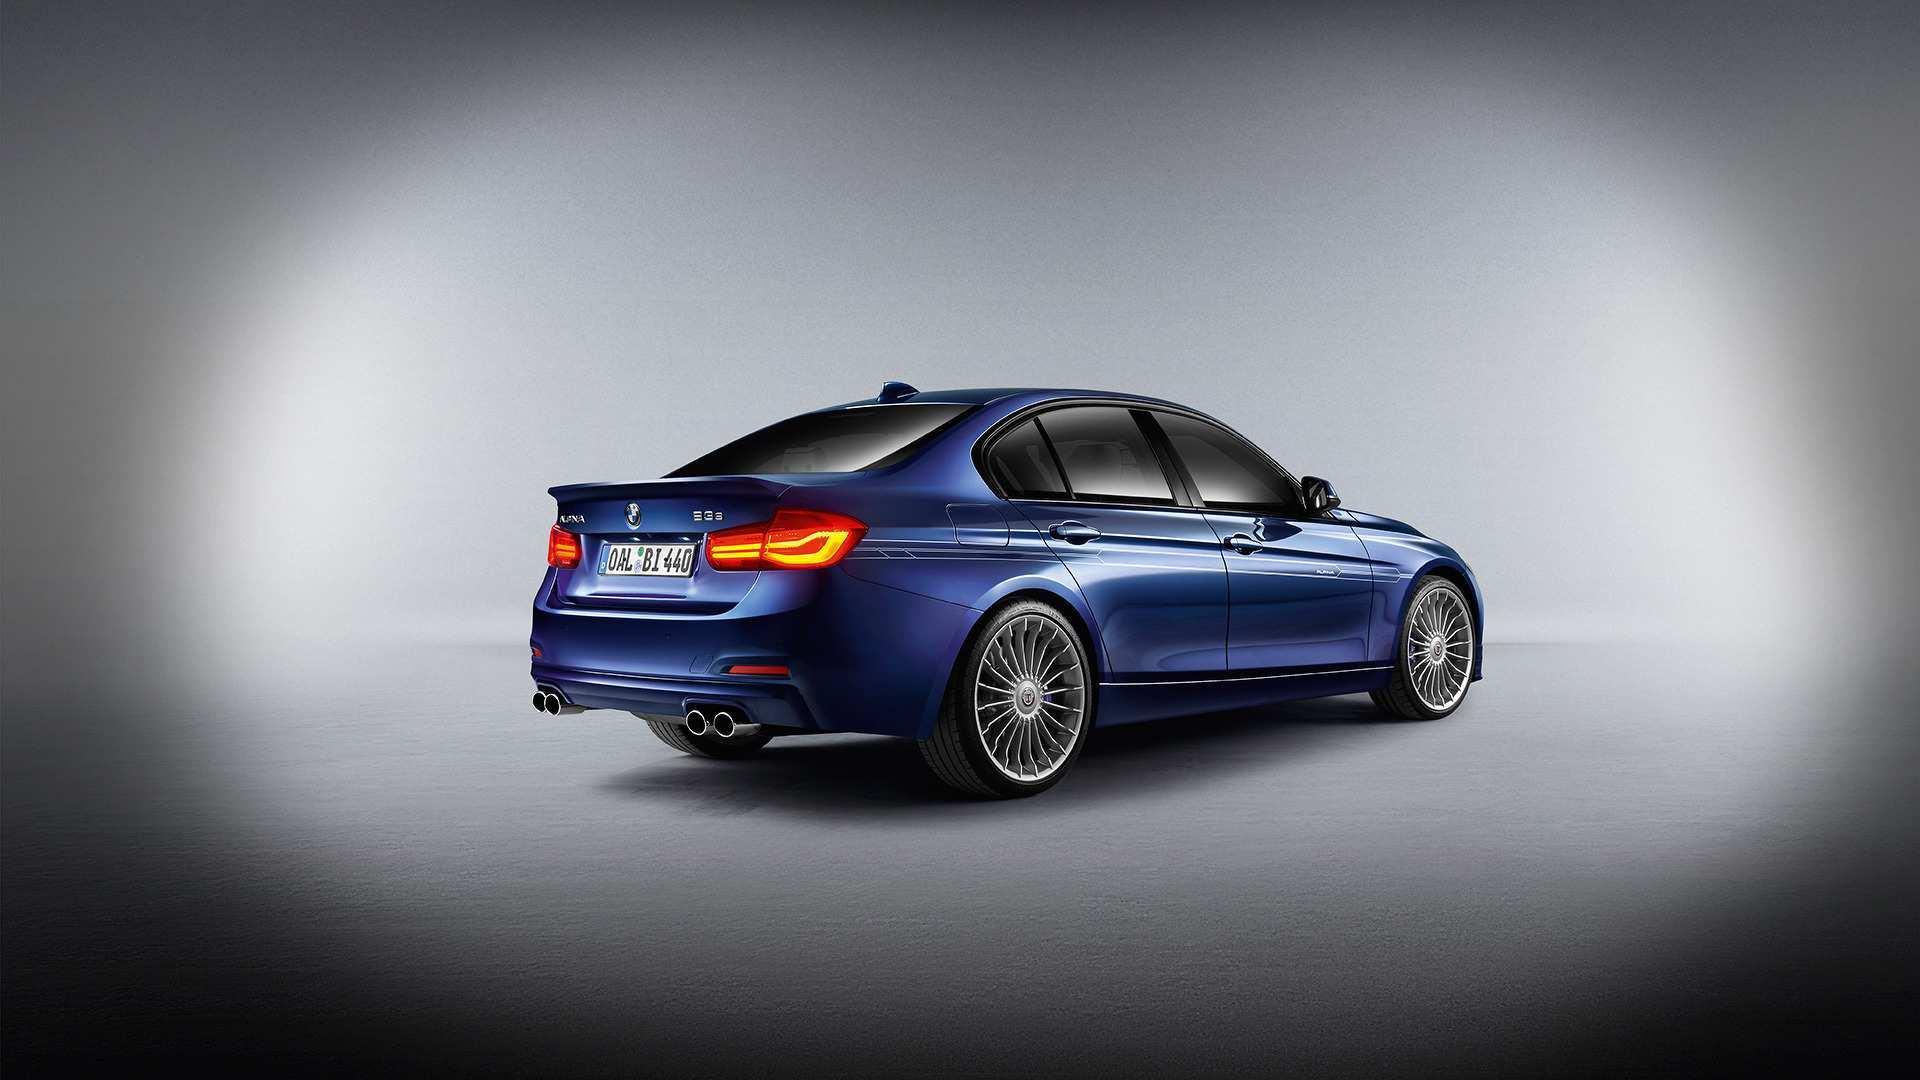 48 All New BMW Alpina B3 2020 Interior with BMW Alpina B3 2020